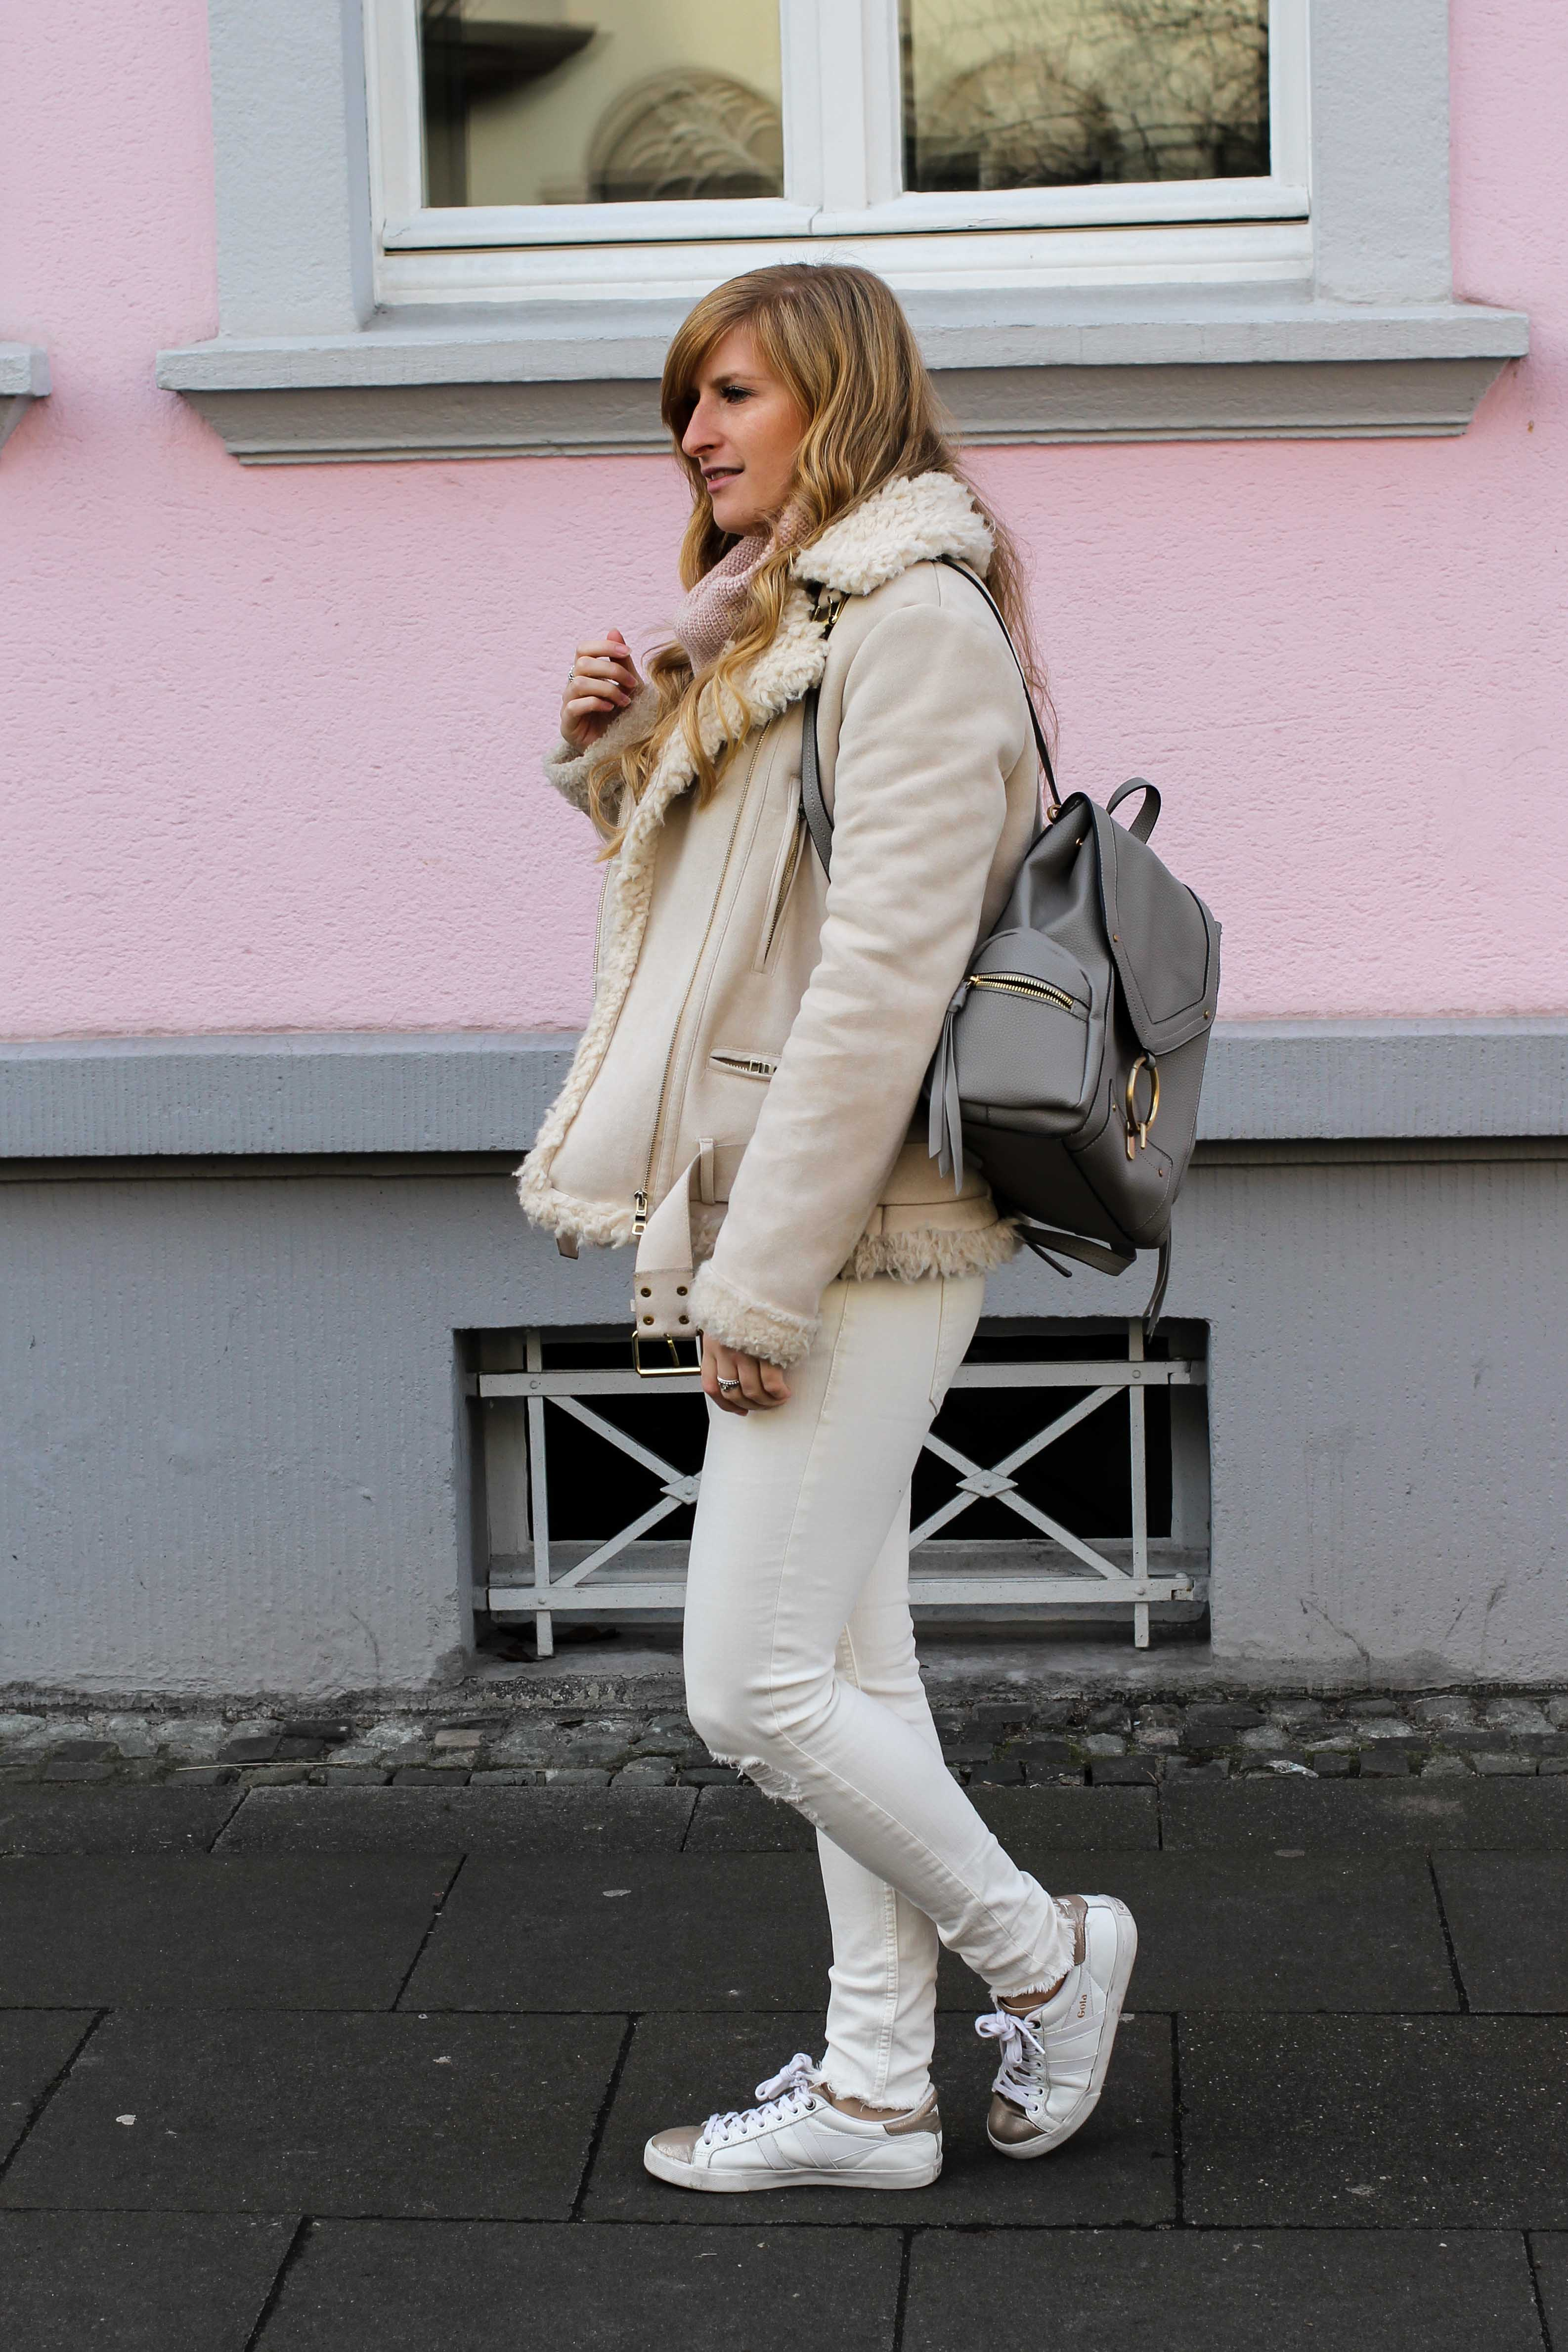 All White Winter Look Helle Farben Winter weiße Sneaker weiße Jeans kombinieren Kustlammfelljacke Zara rosa Rollkragenpullover Modeblog Bonn 3